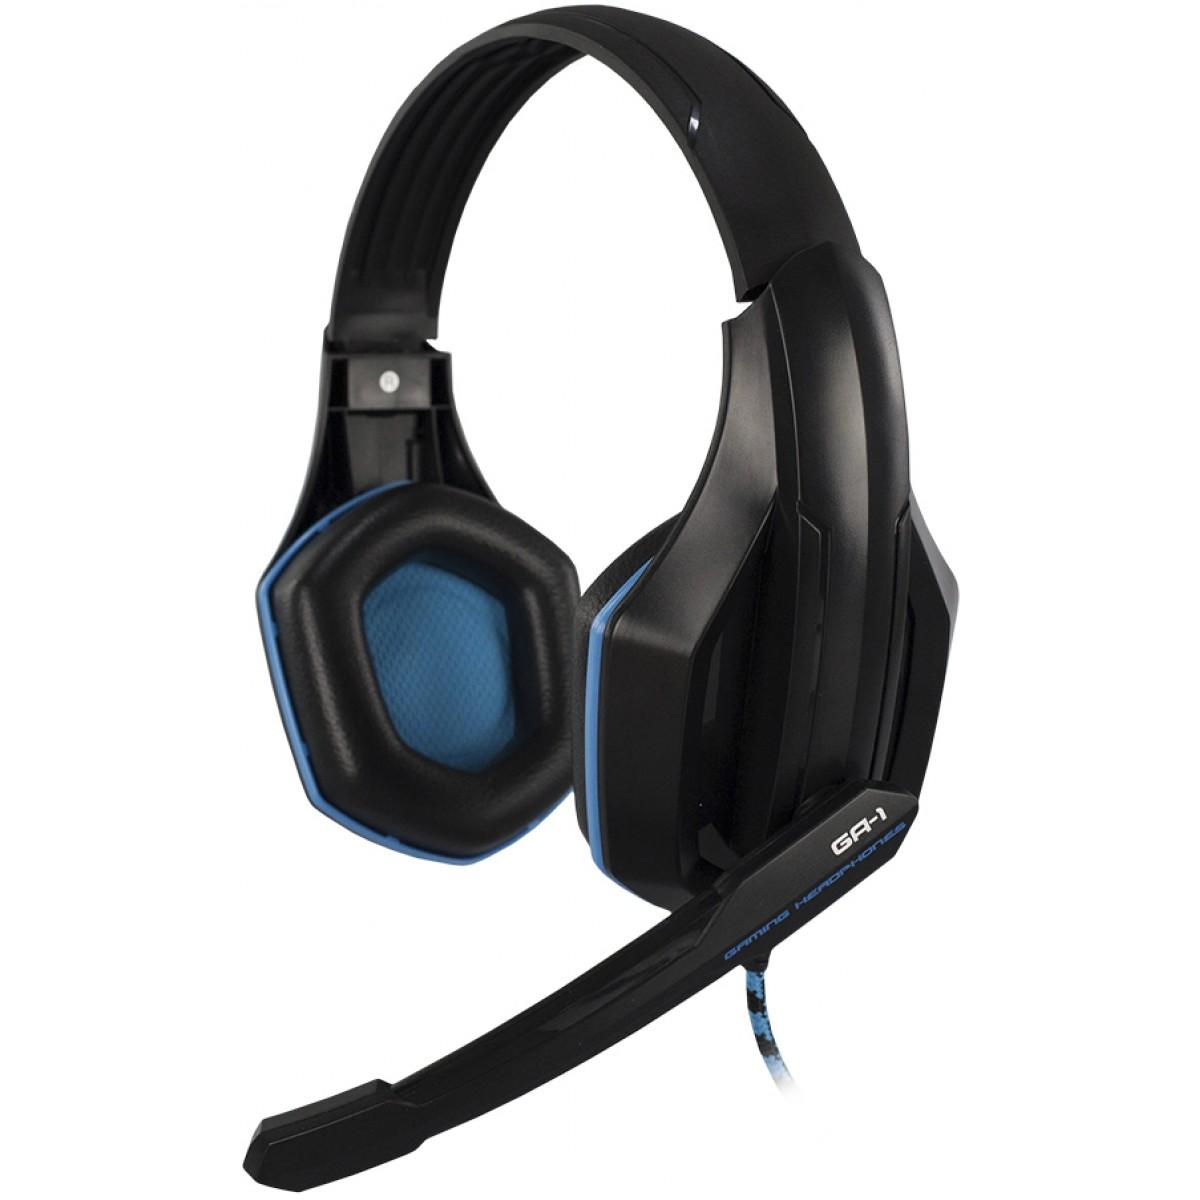 Headset Gamer Hoopson Pro Stereo, Preto e Azul, GA-1